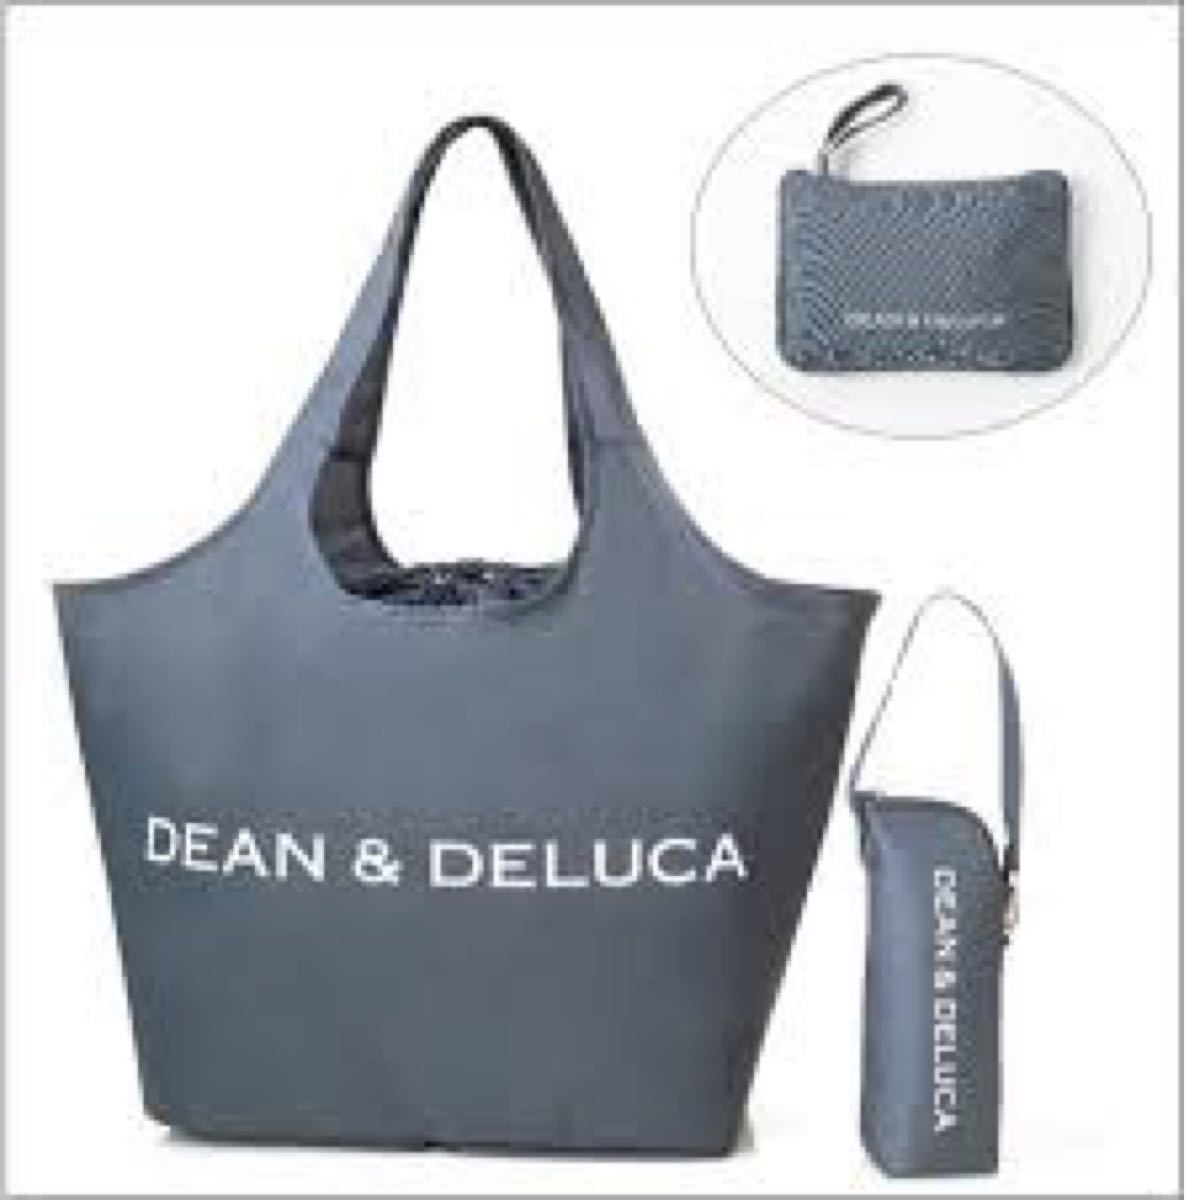 DEAN&DELUCA エコバッグ ディーン&デルーカ ショッピングバッグ トートバッグ オトナミューズ 保冷バッグ